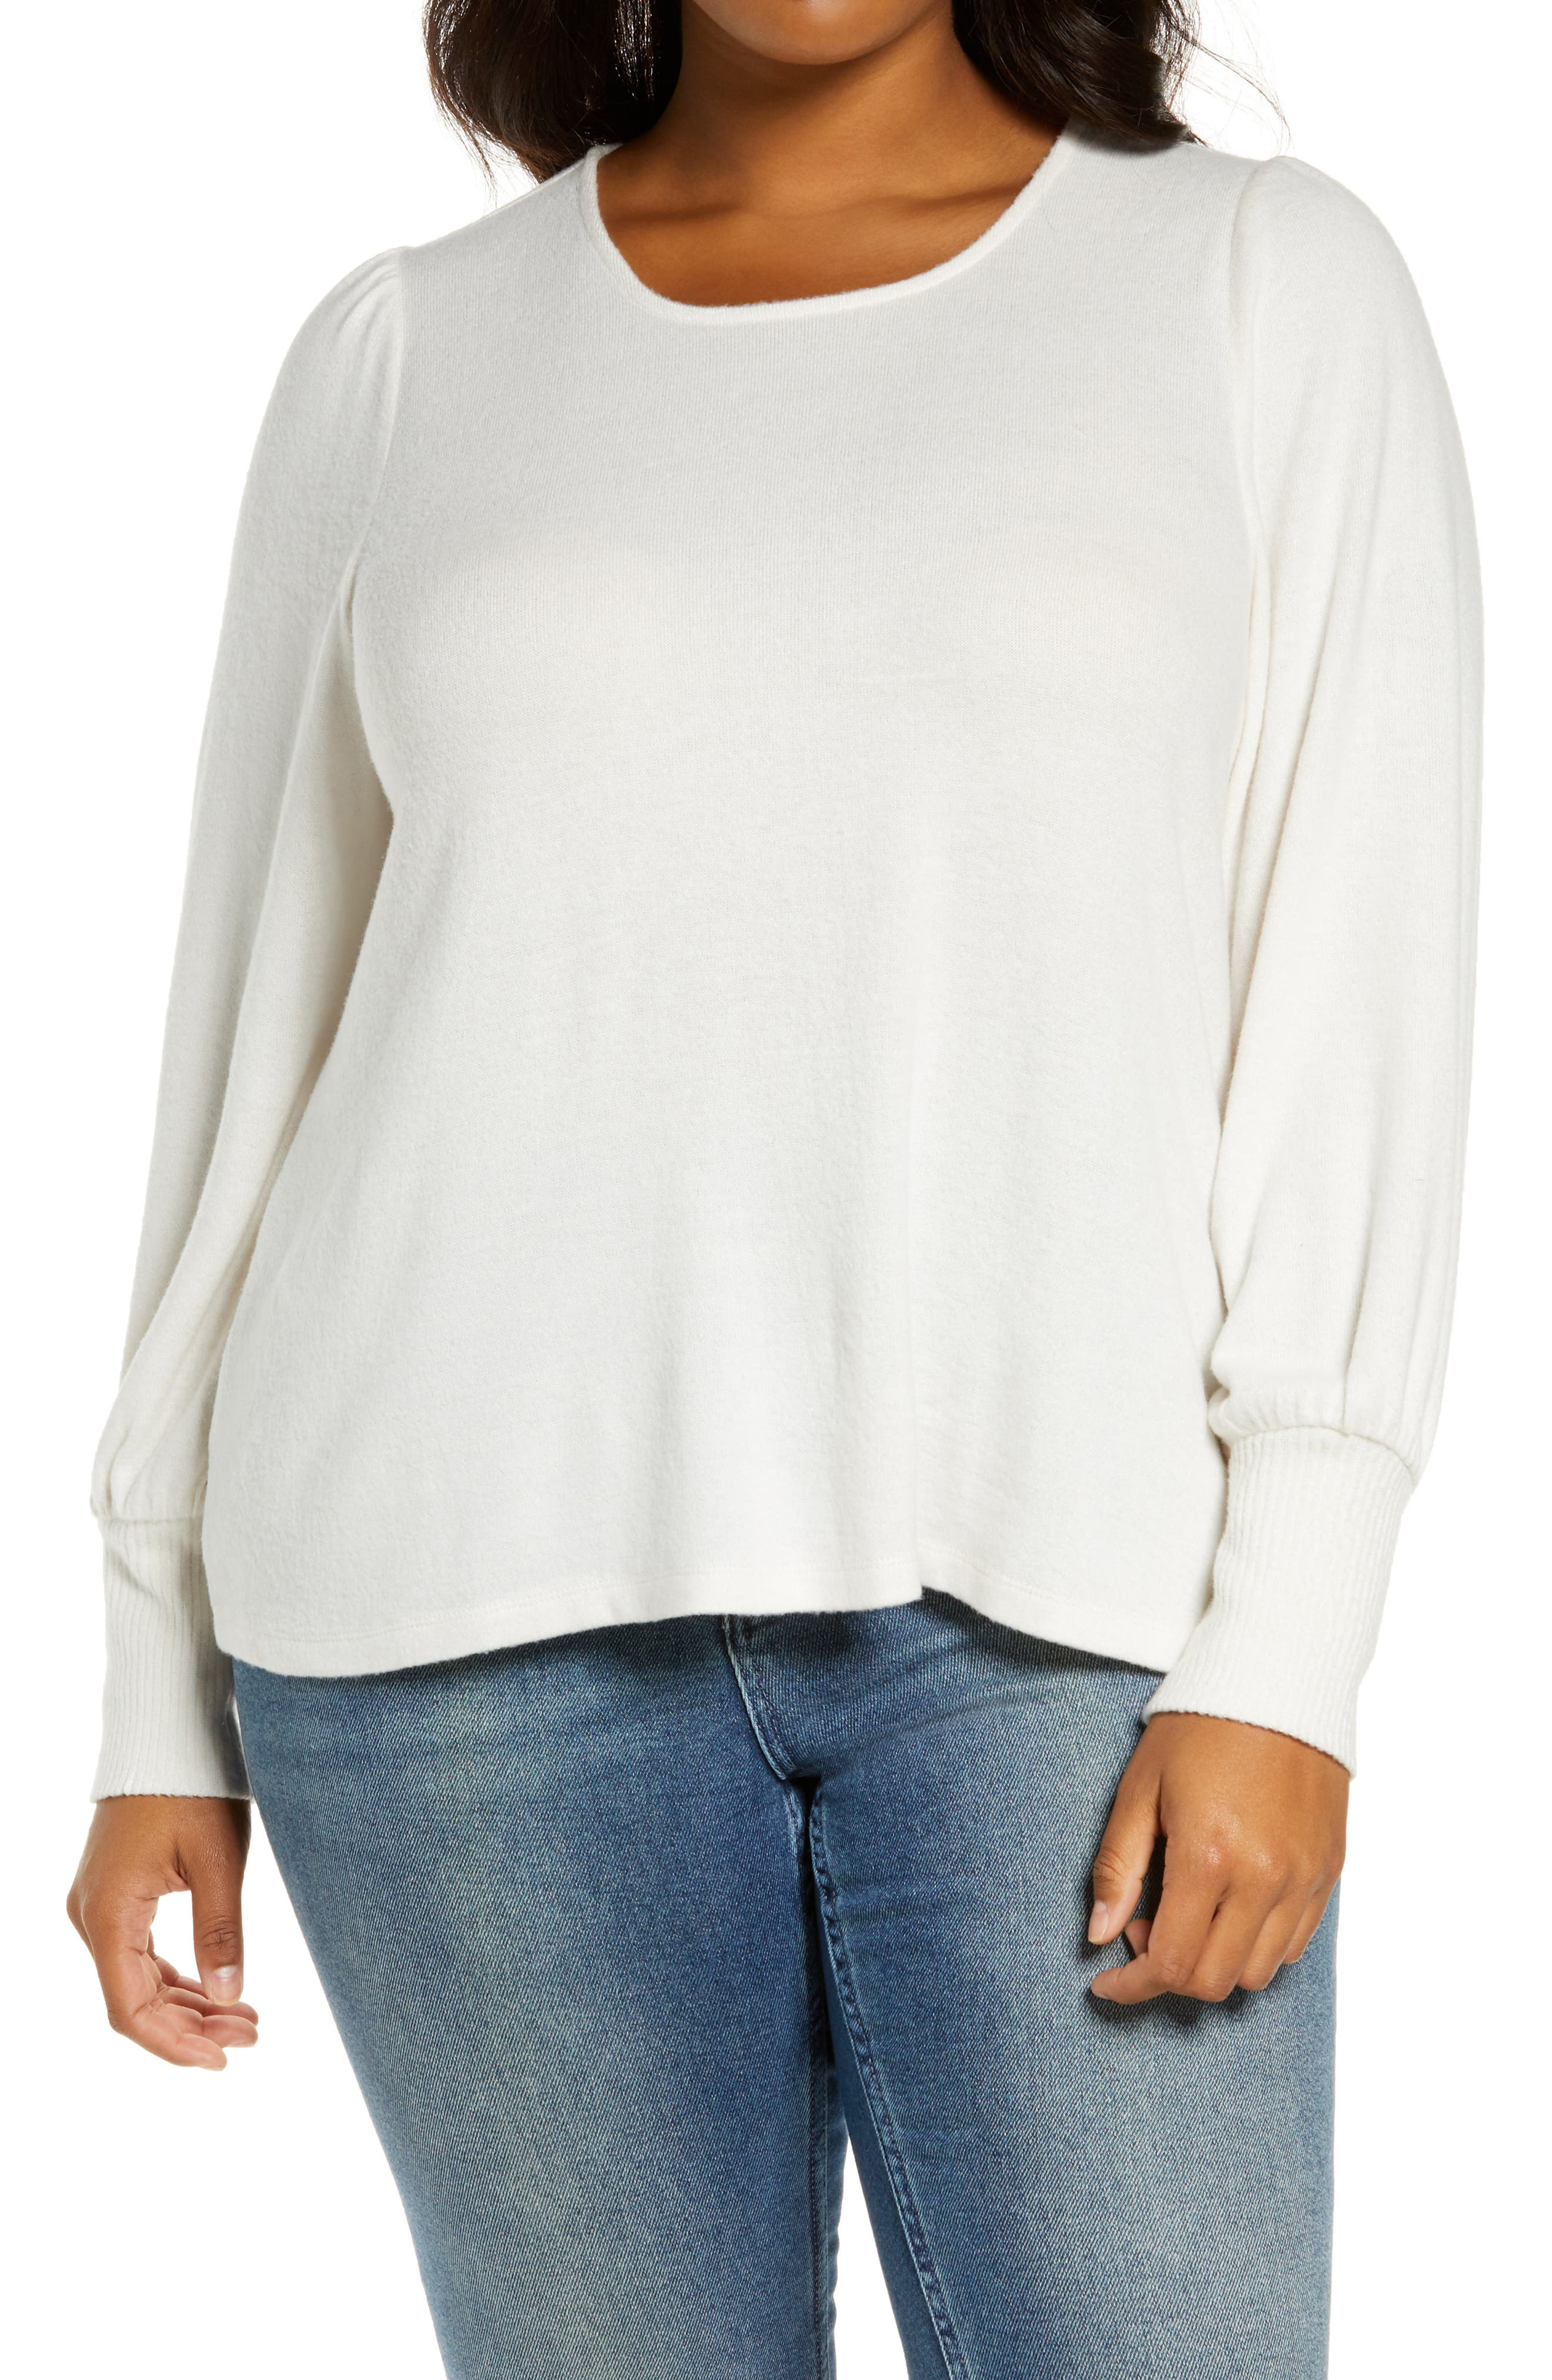 Woman\u2019s white lace shell lined size XL  fits like size 16  Made by Ruby Lane